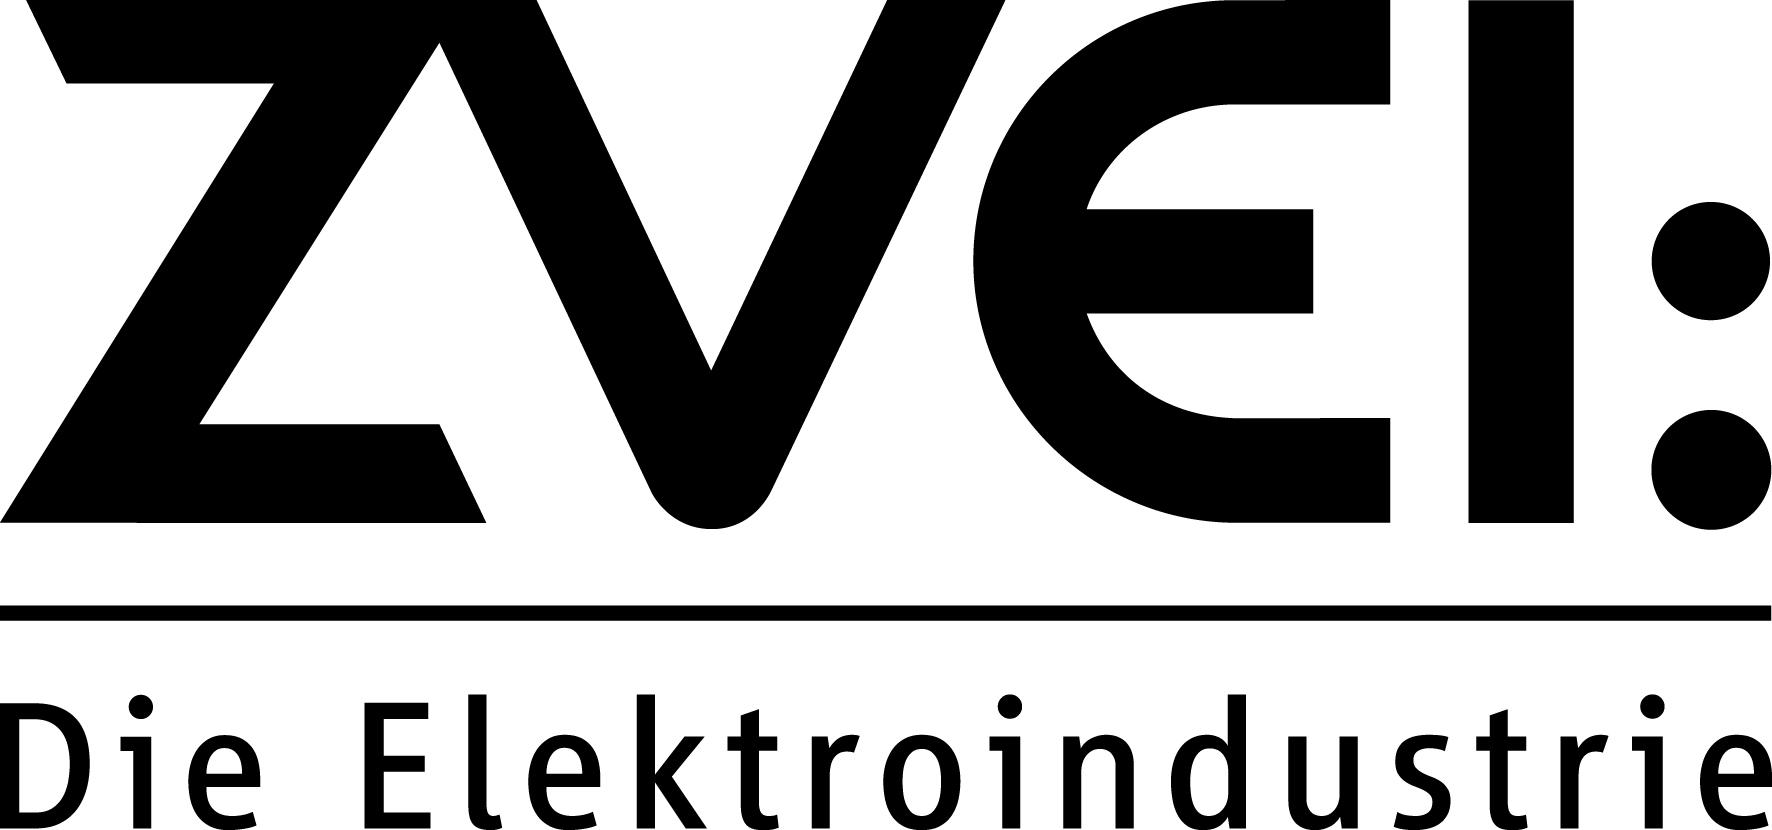 Zentralverband Elektrotechnik- und Elektronikindustrie e. V. (ZVEI)